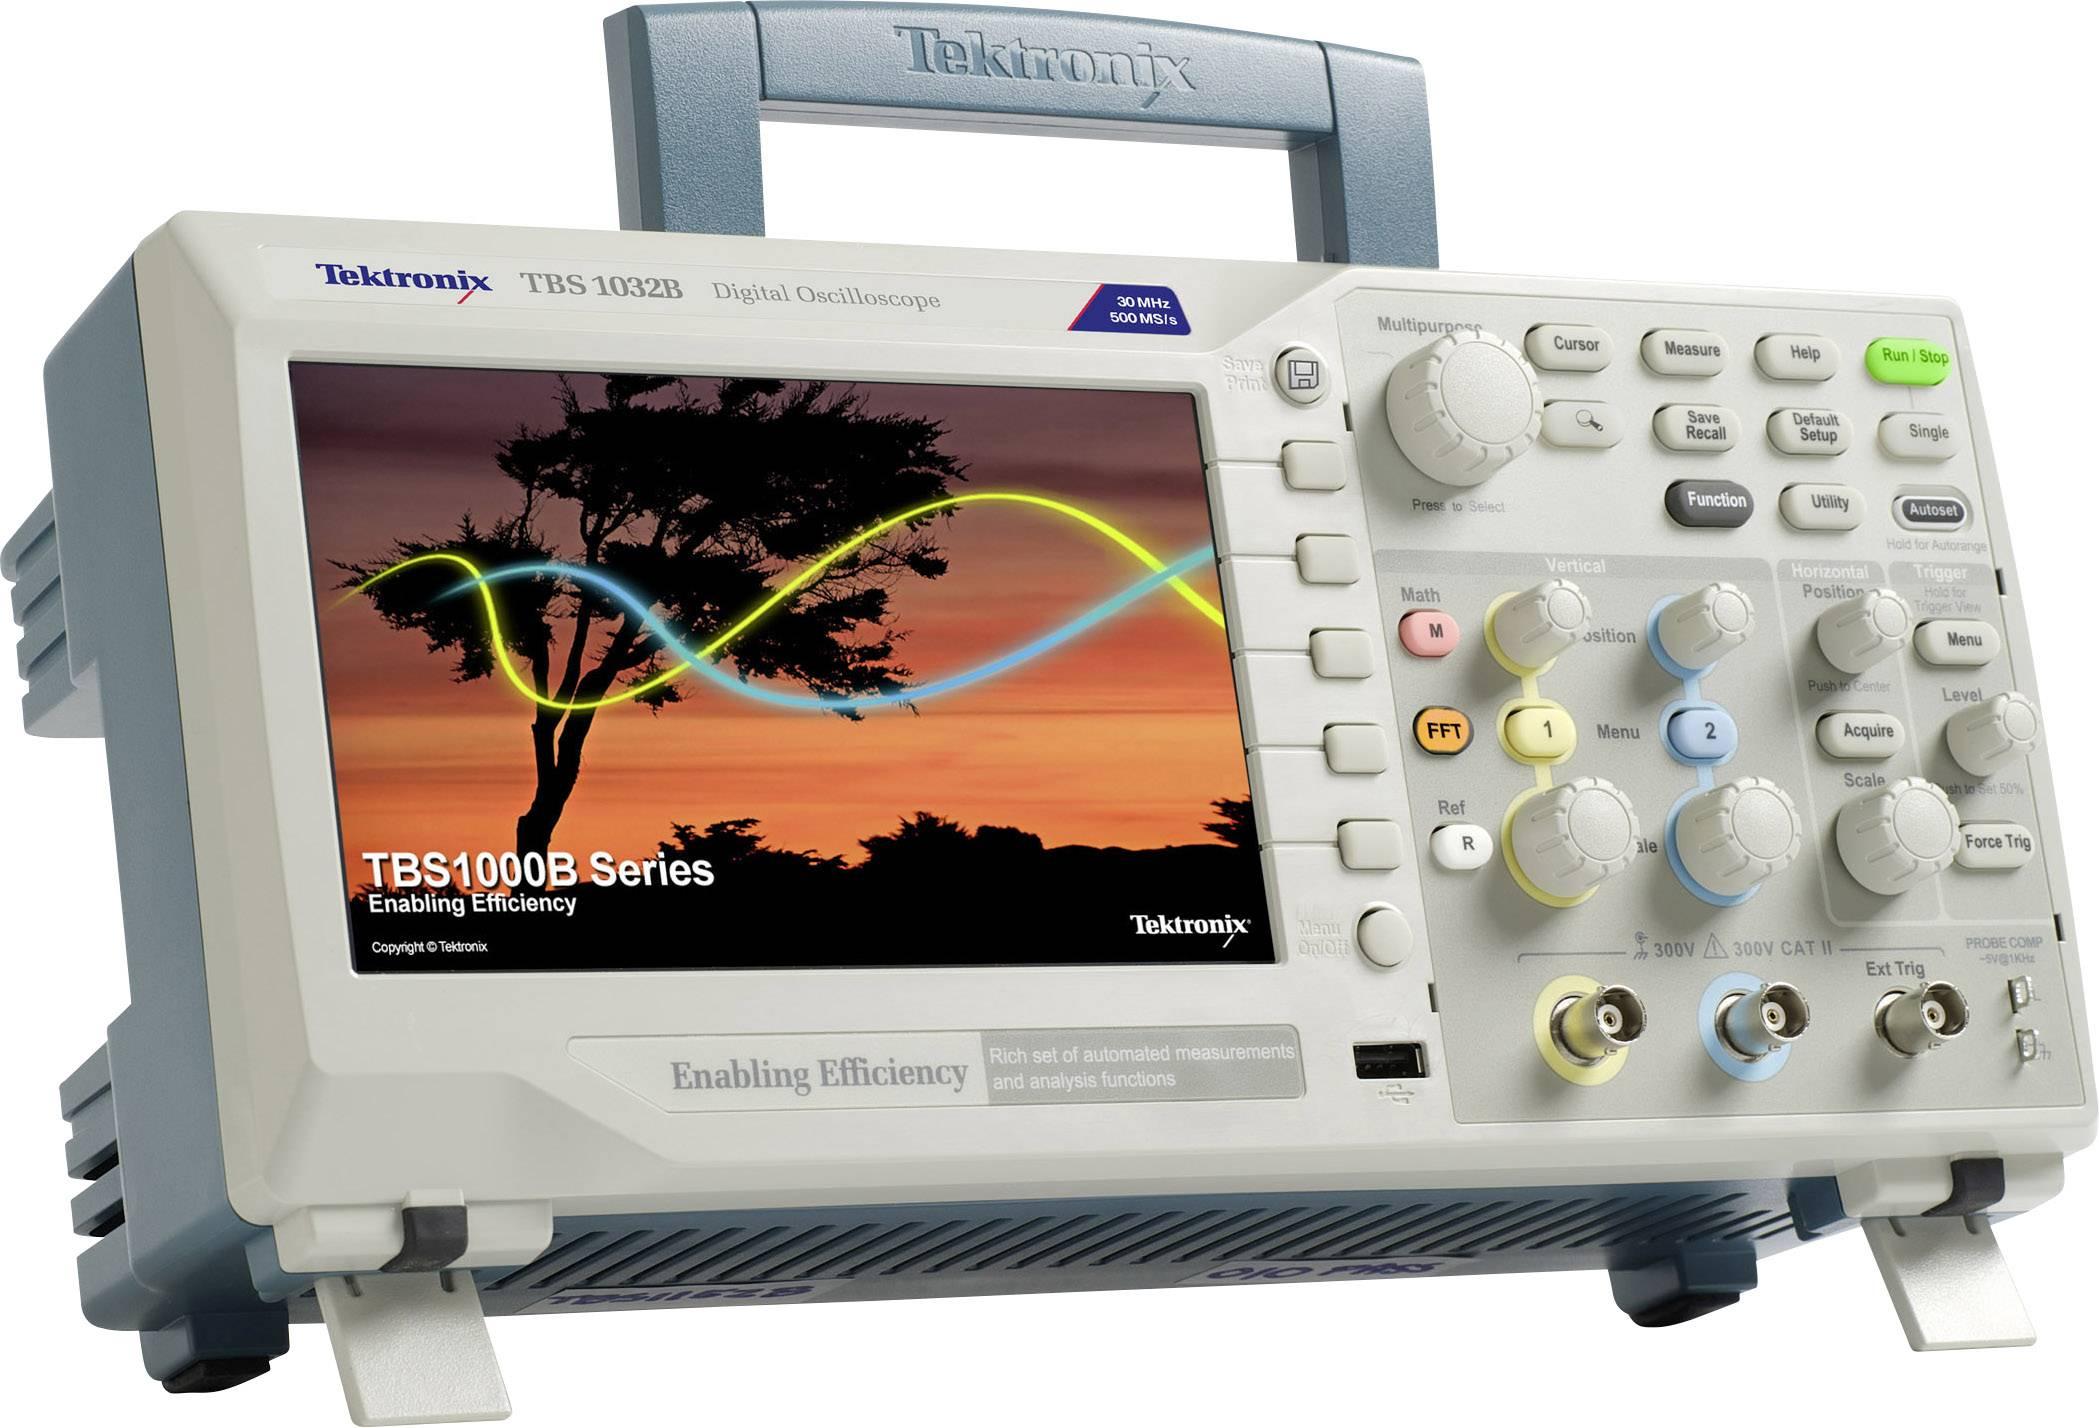 Digitálny osciloskop Tektronix TBS1032B, 30 MHz, 2-kanálový, kalibrácia podľa ISO